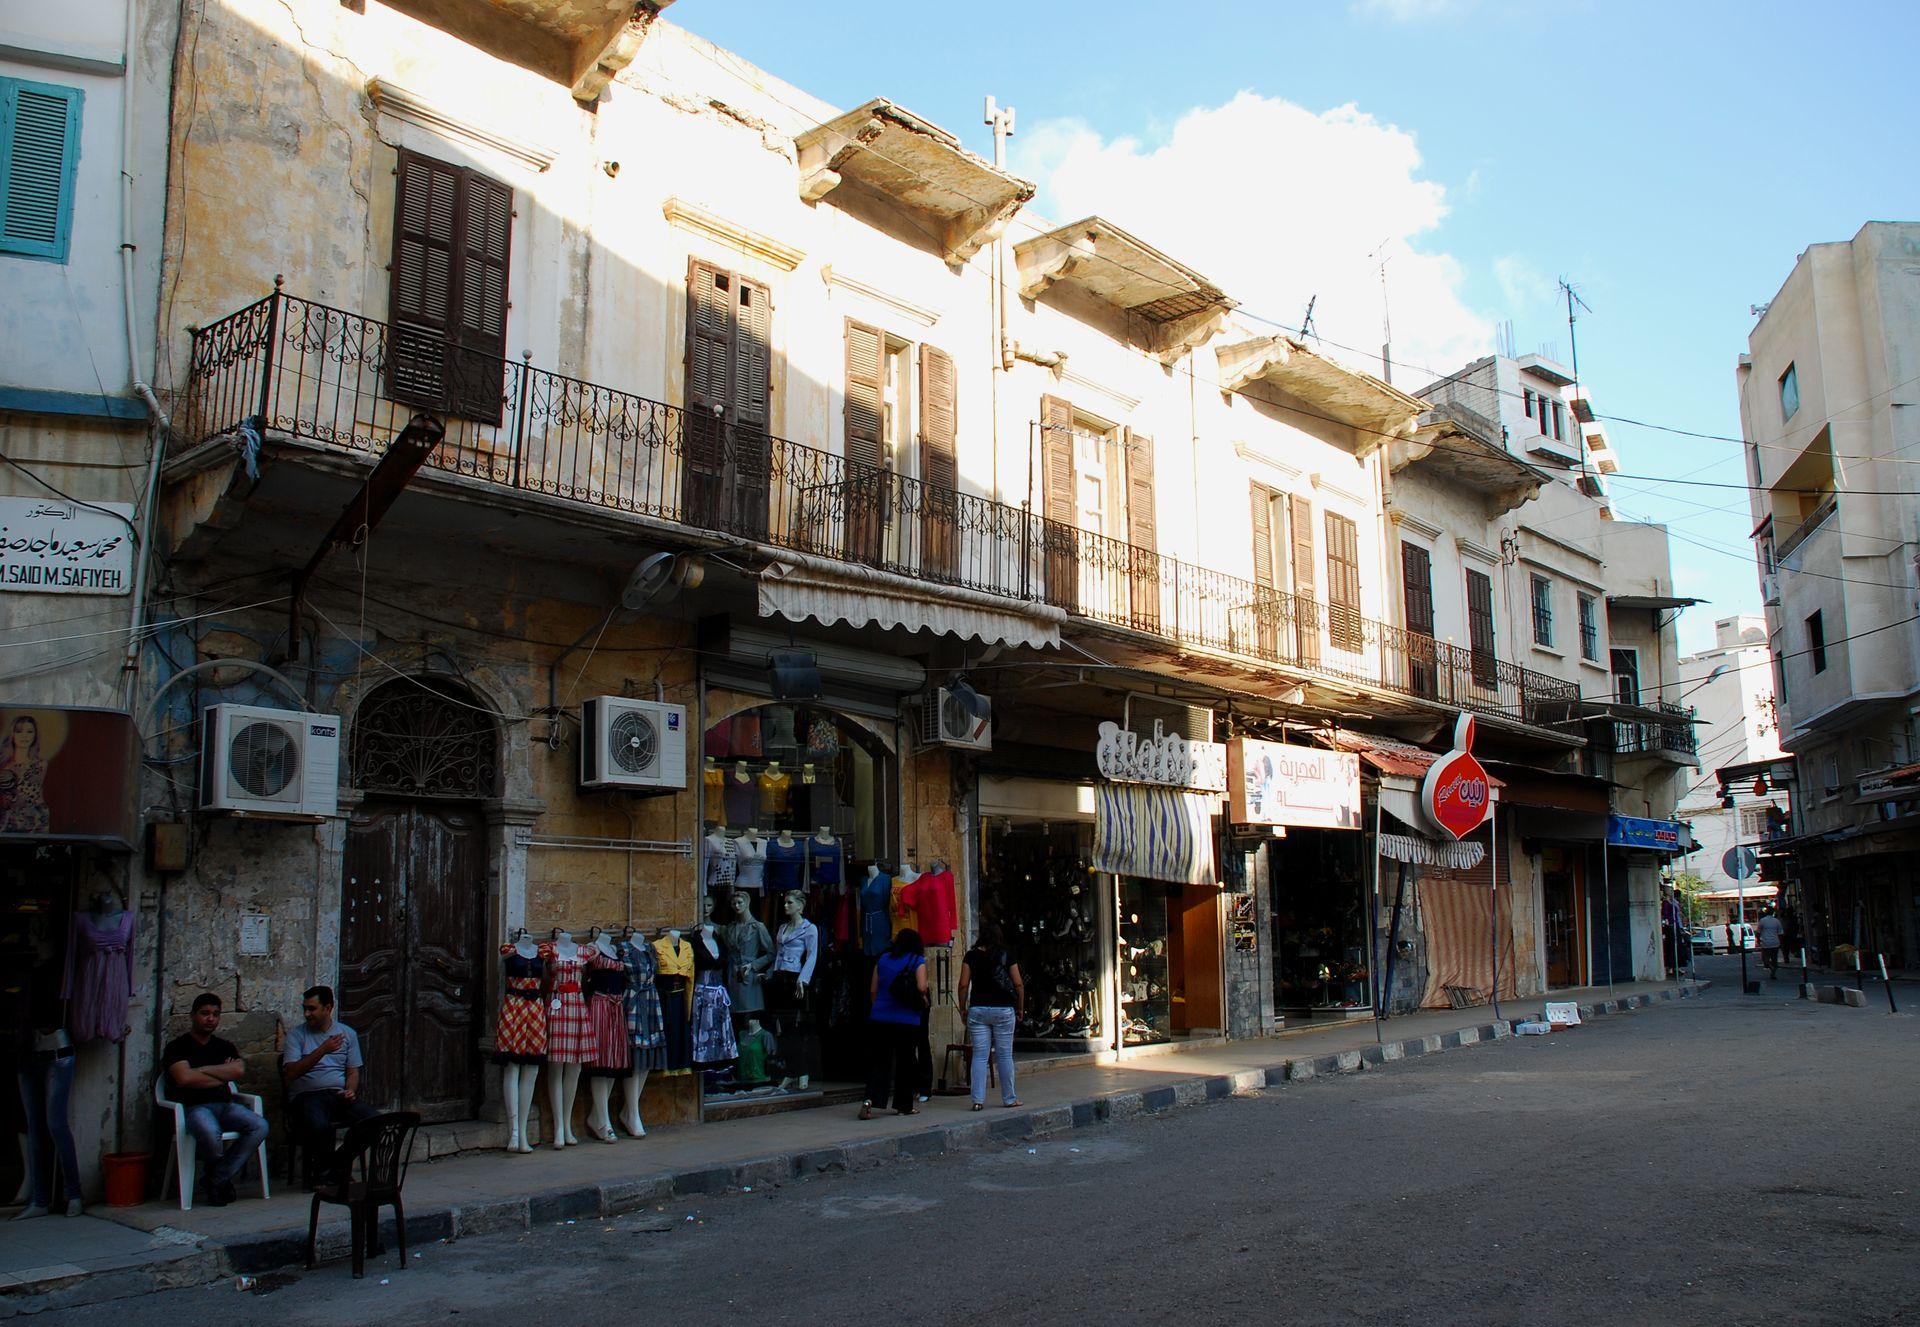 File:Latakia,old.jpg - Wikimedia Commons